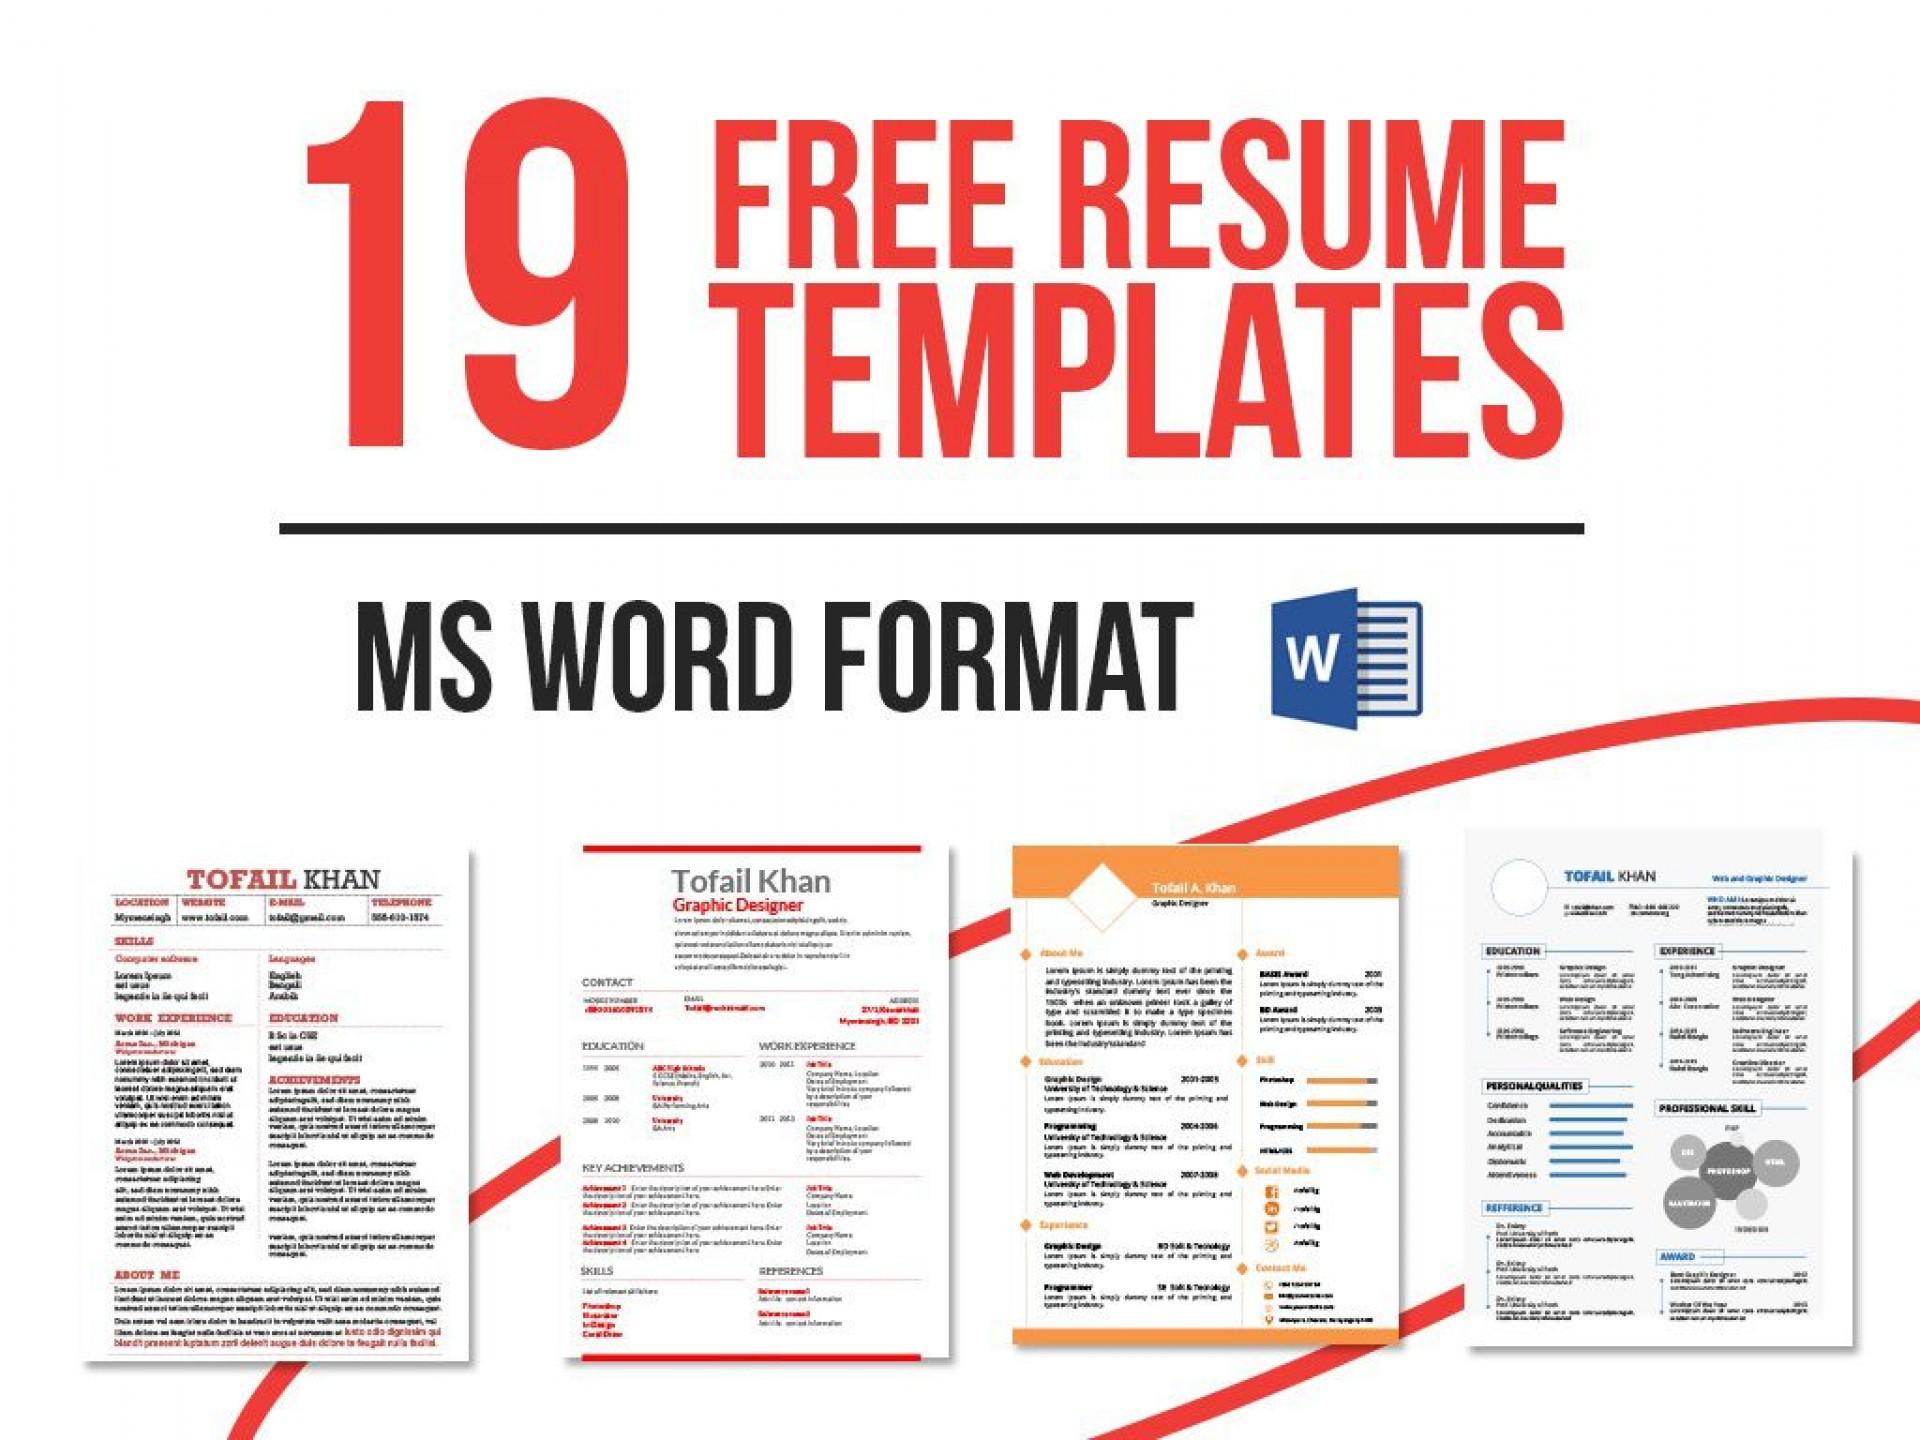 005 Astounding Microsoft Word Template Download Sample  2010 Resume Free 2007 Error Invoice1920